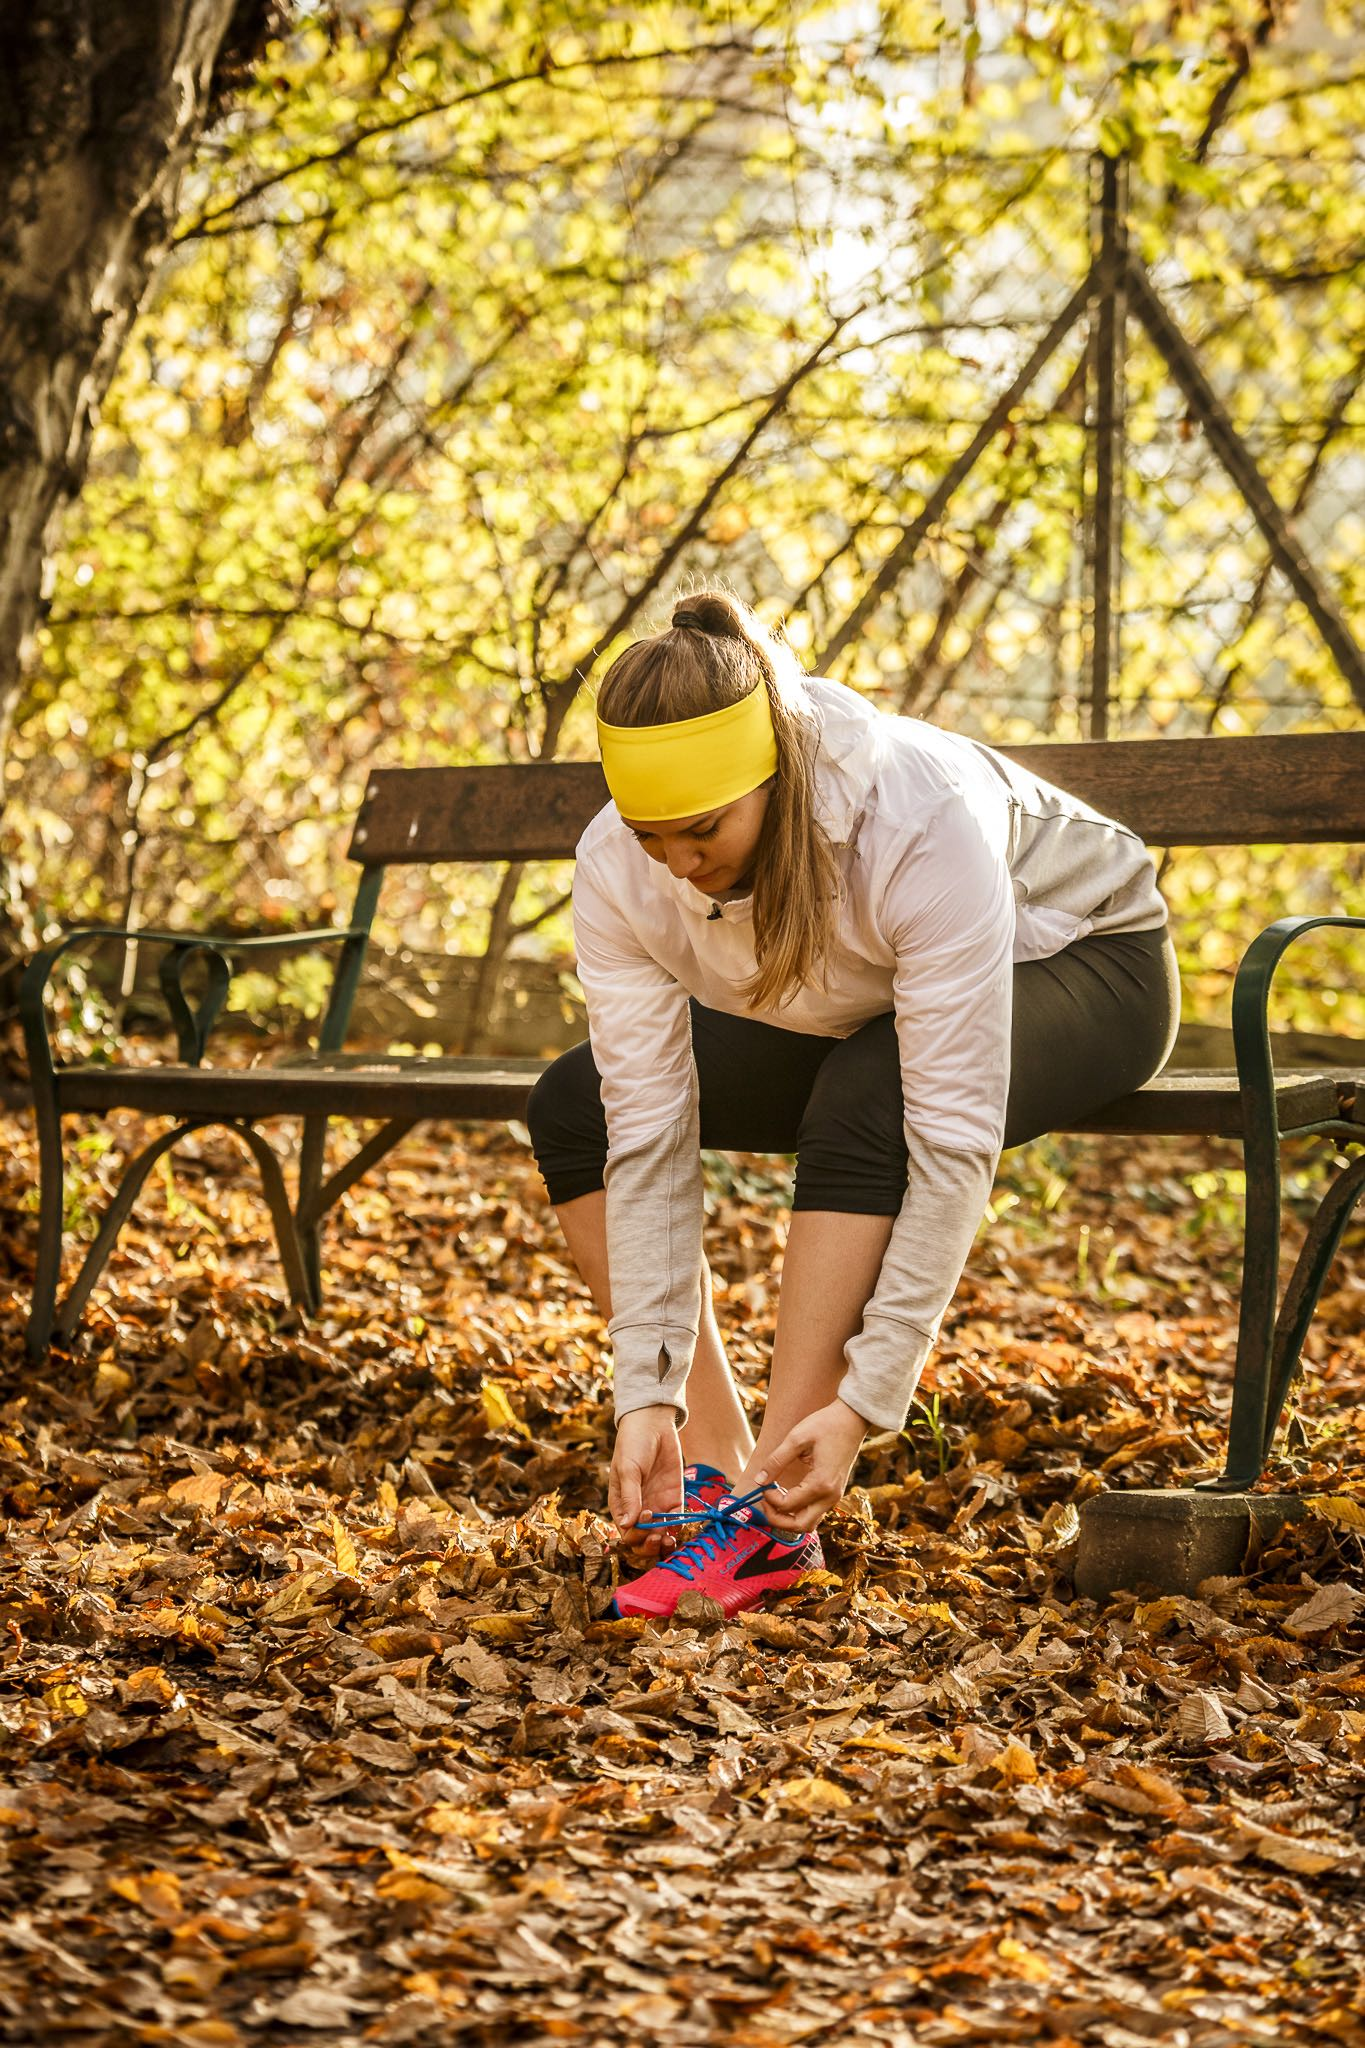 Ausdauertraining-Grundlagenausdauer-Klara-Fuchs-Fitnessblog-Sport-Training-Gesundheit